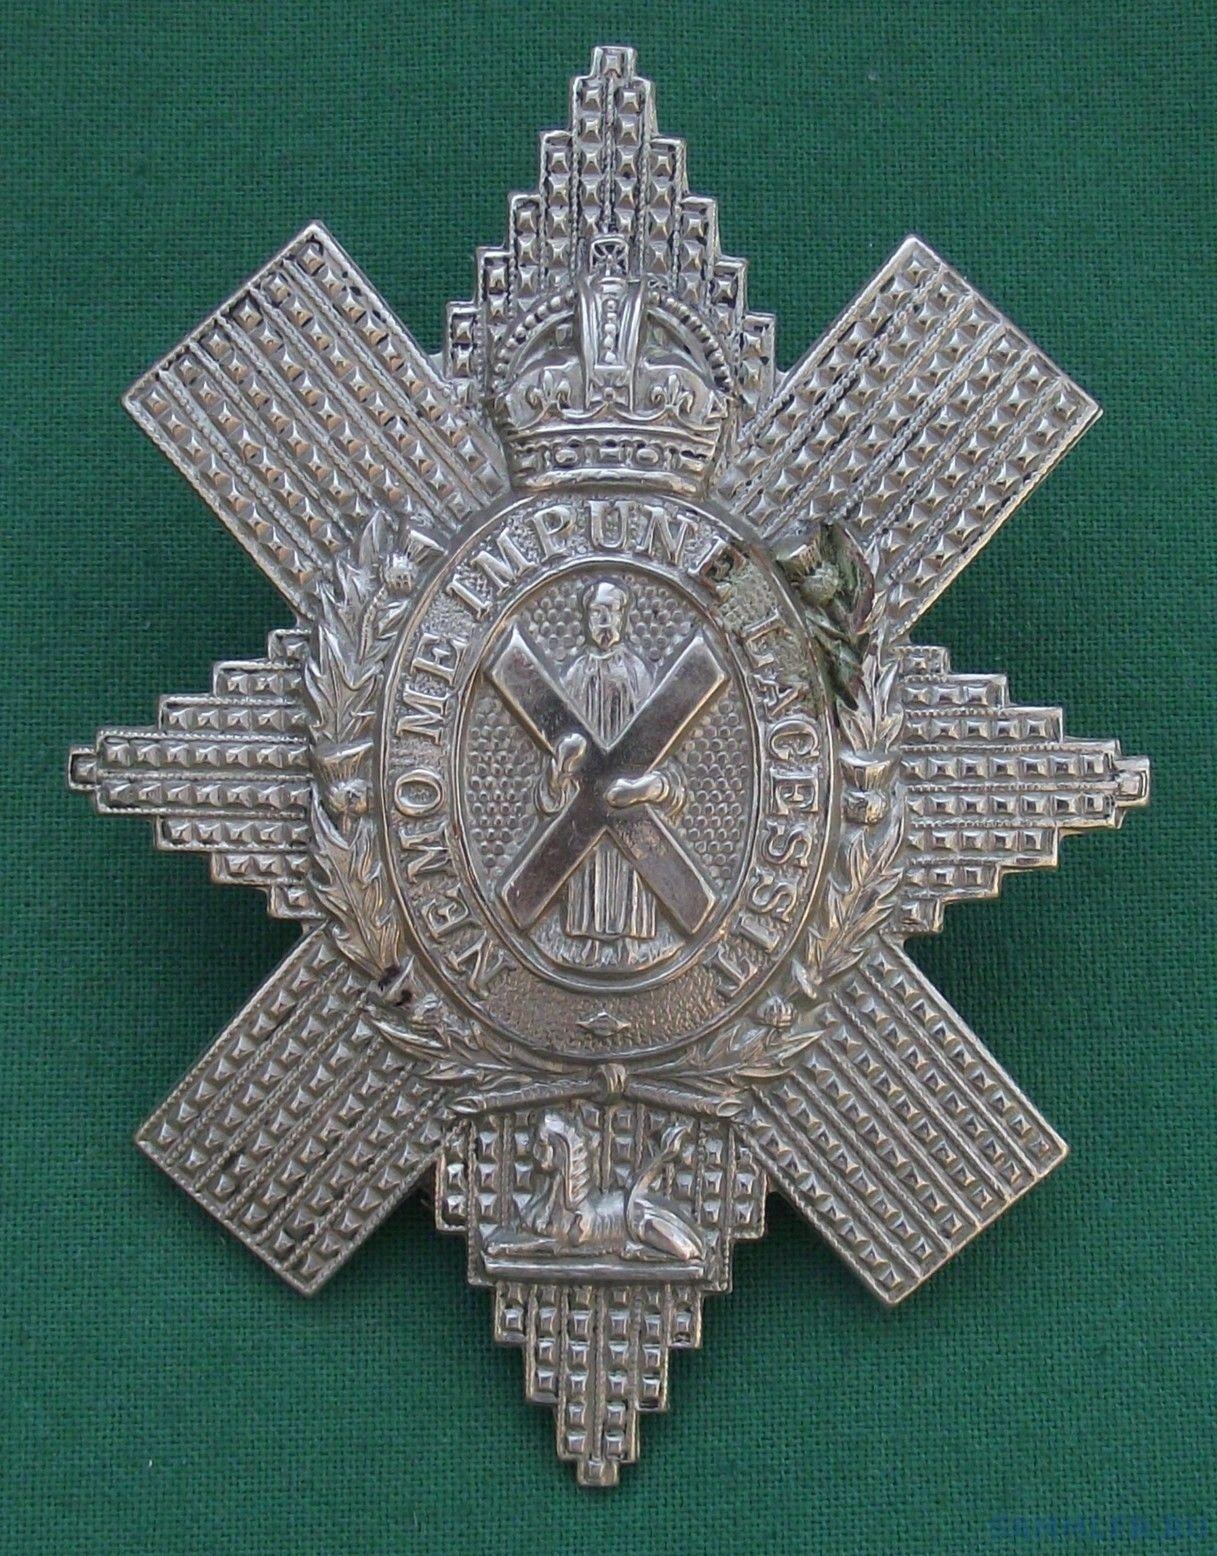 The-Black-Watch-100-Genuine-WW2-British-_57.jpg